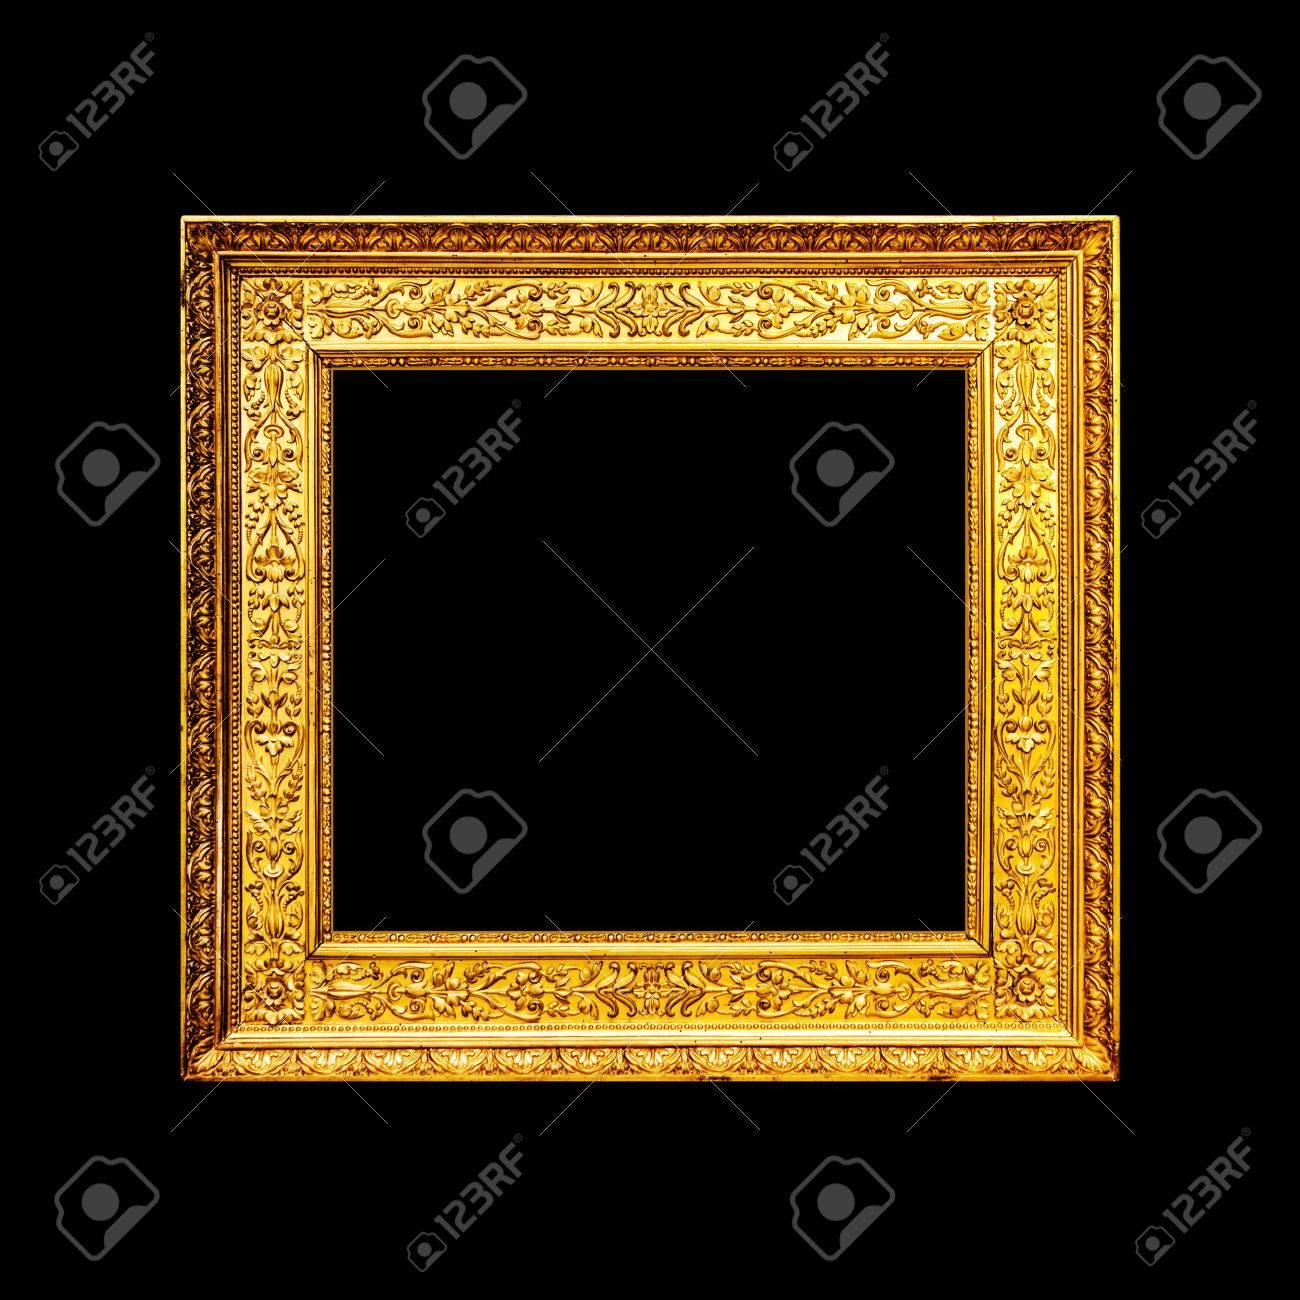 old antique ornate frame border stock photo 7239013262 antique